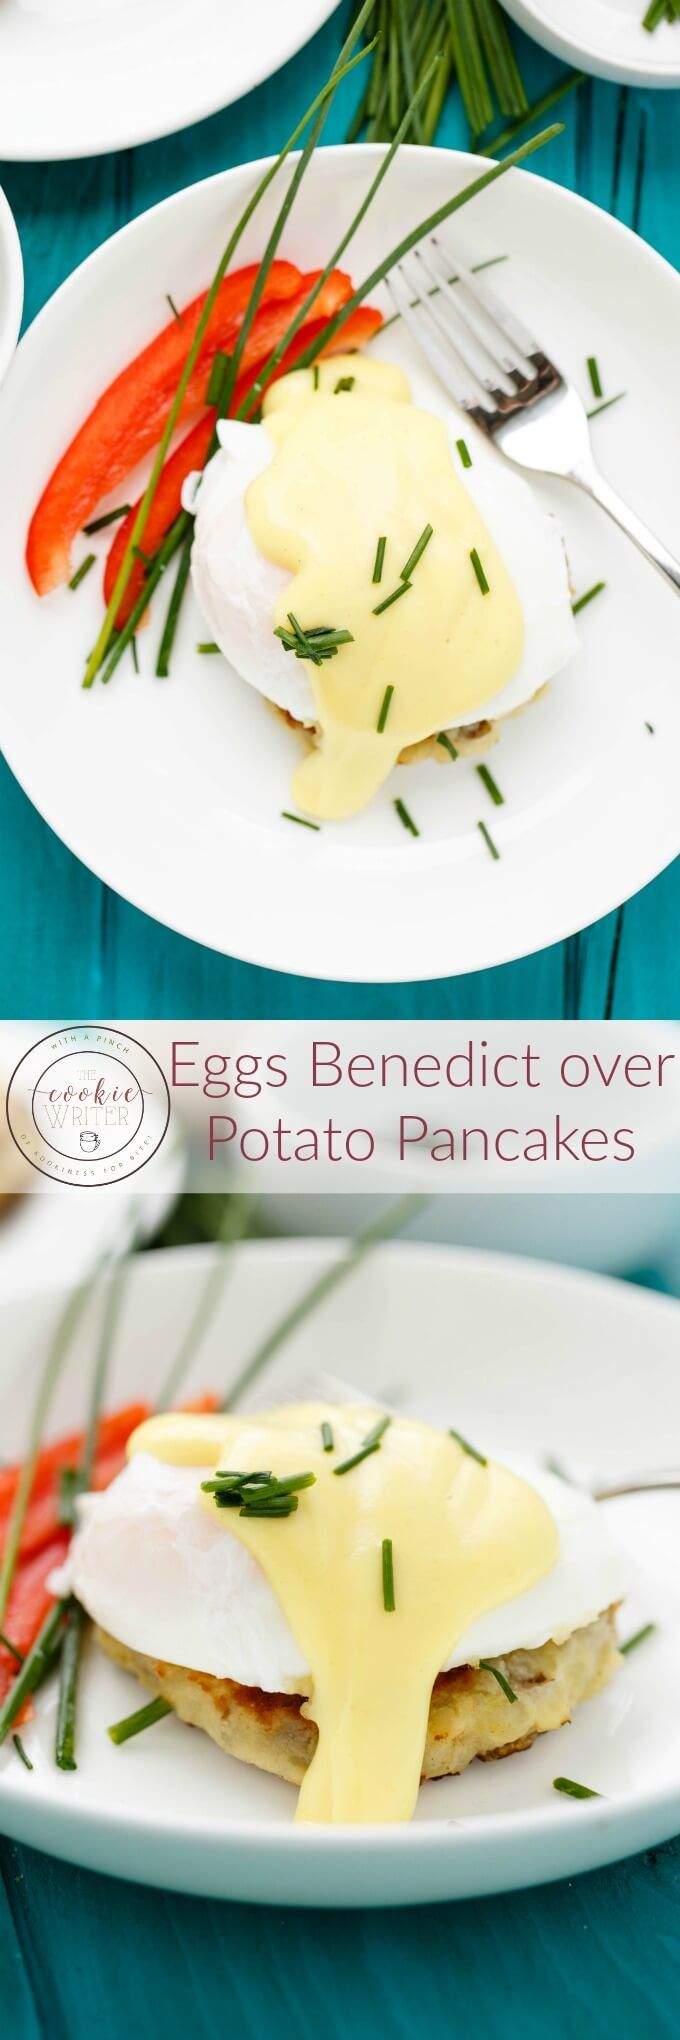 Eggs Benedict over Potato Patties | http://thecookiewriter.com | @thecookiewriter | #breakfast (ad)